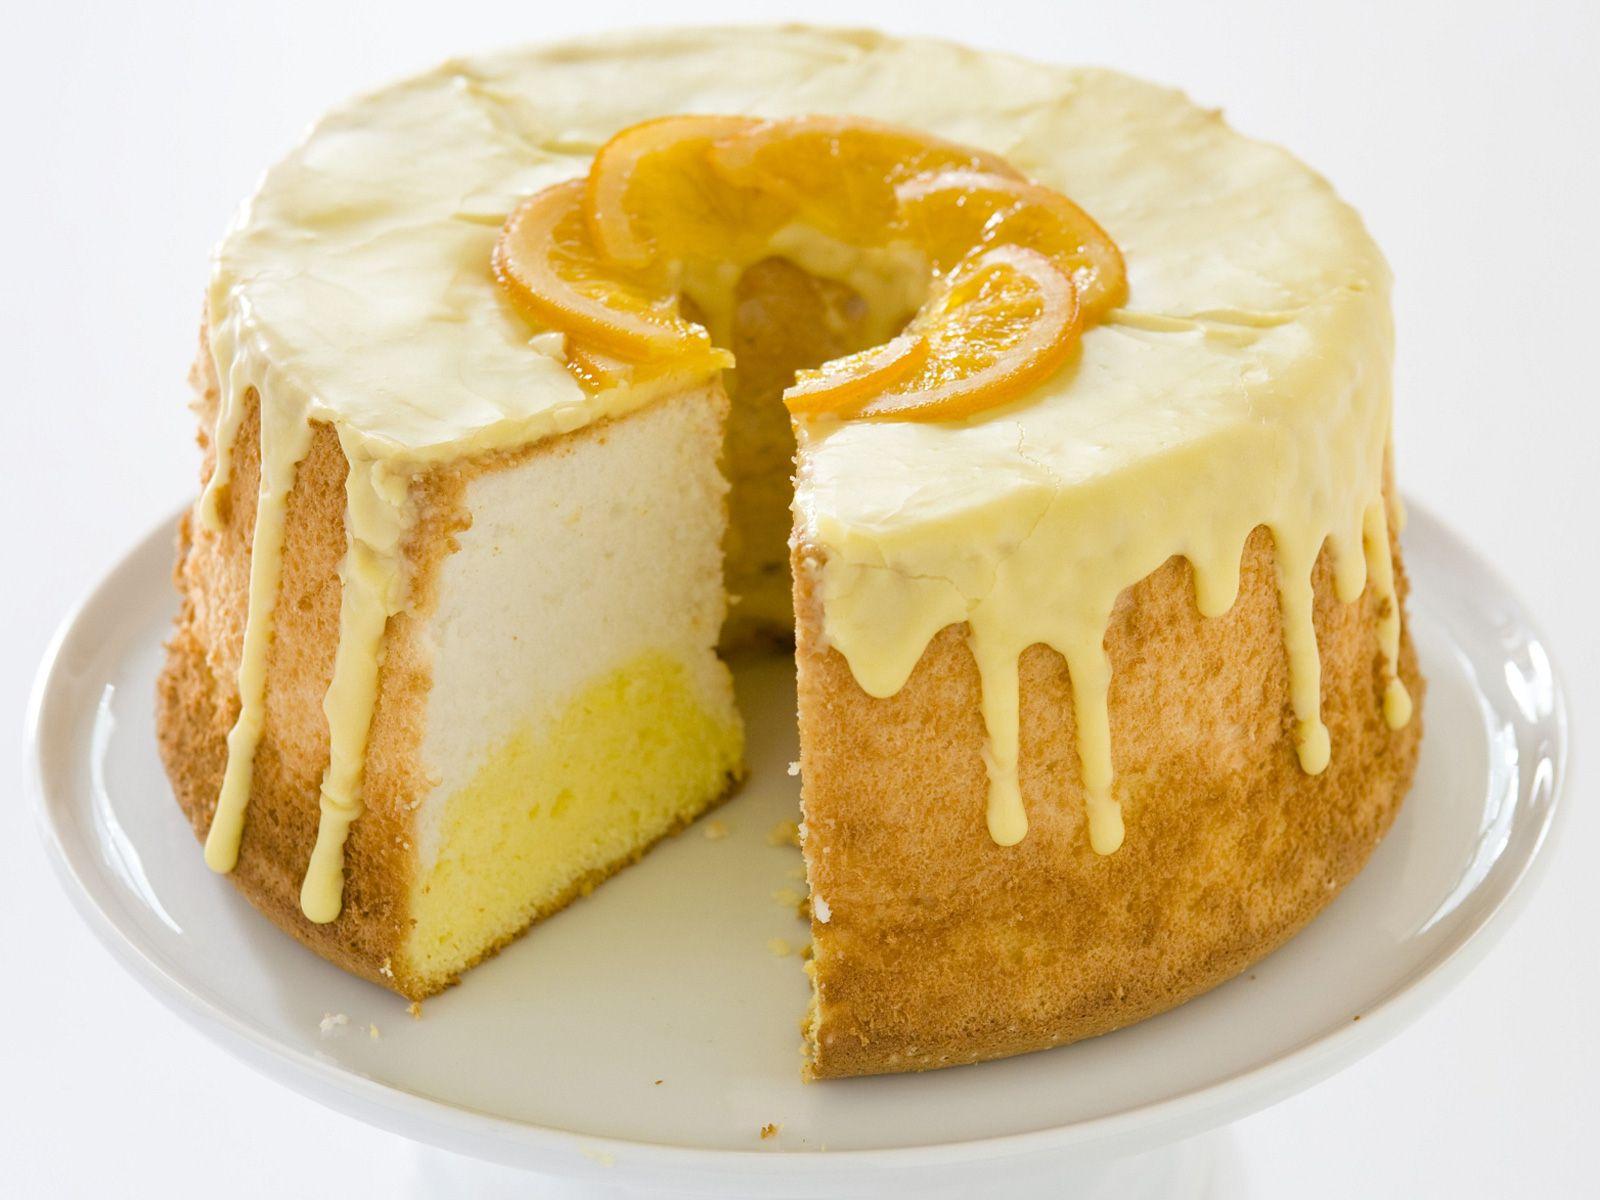 engelskuchen mit orange (angel food cake)   eat smarter - Engels Küche